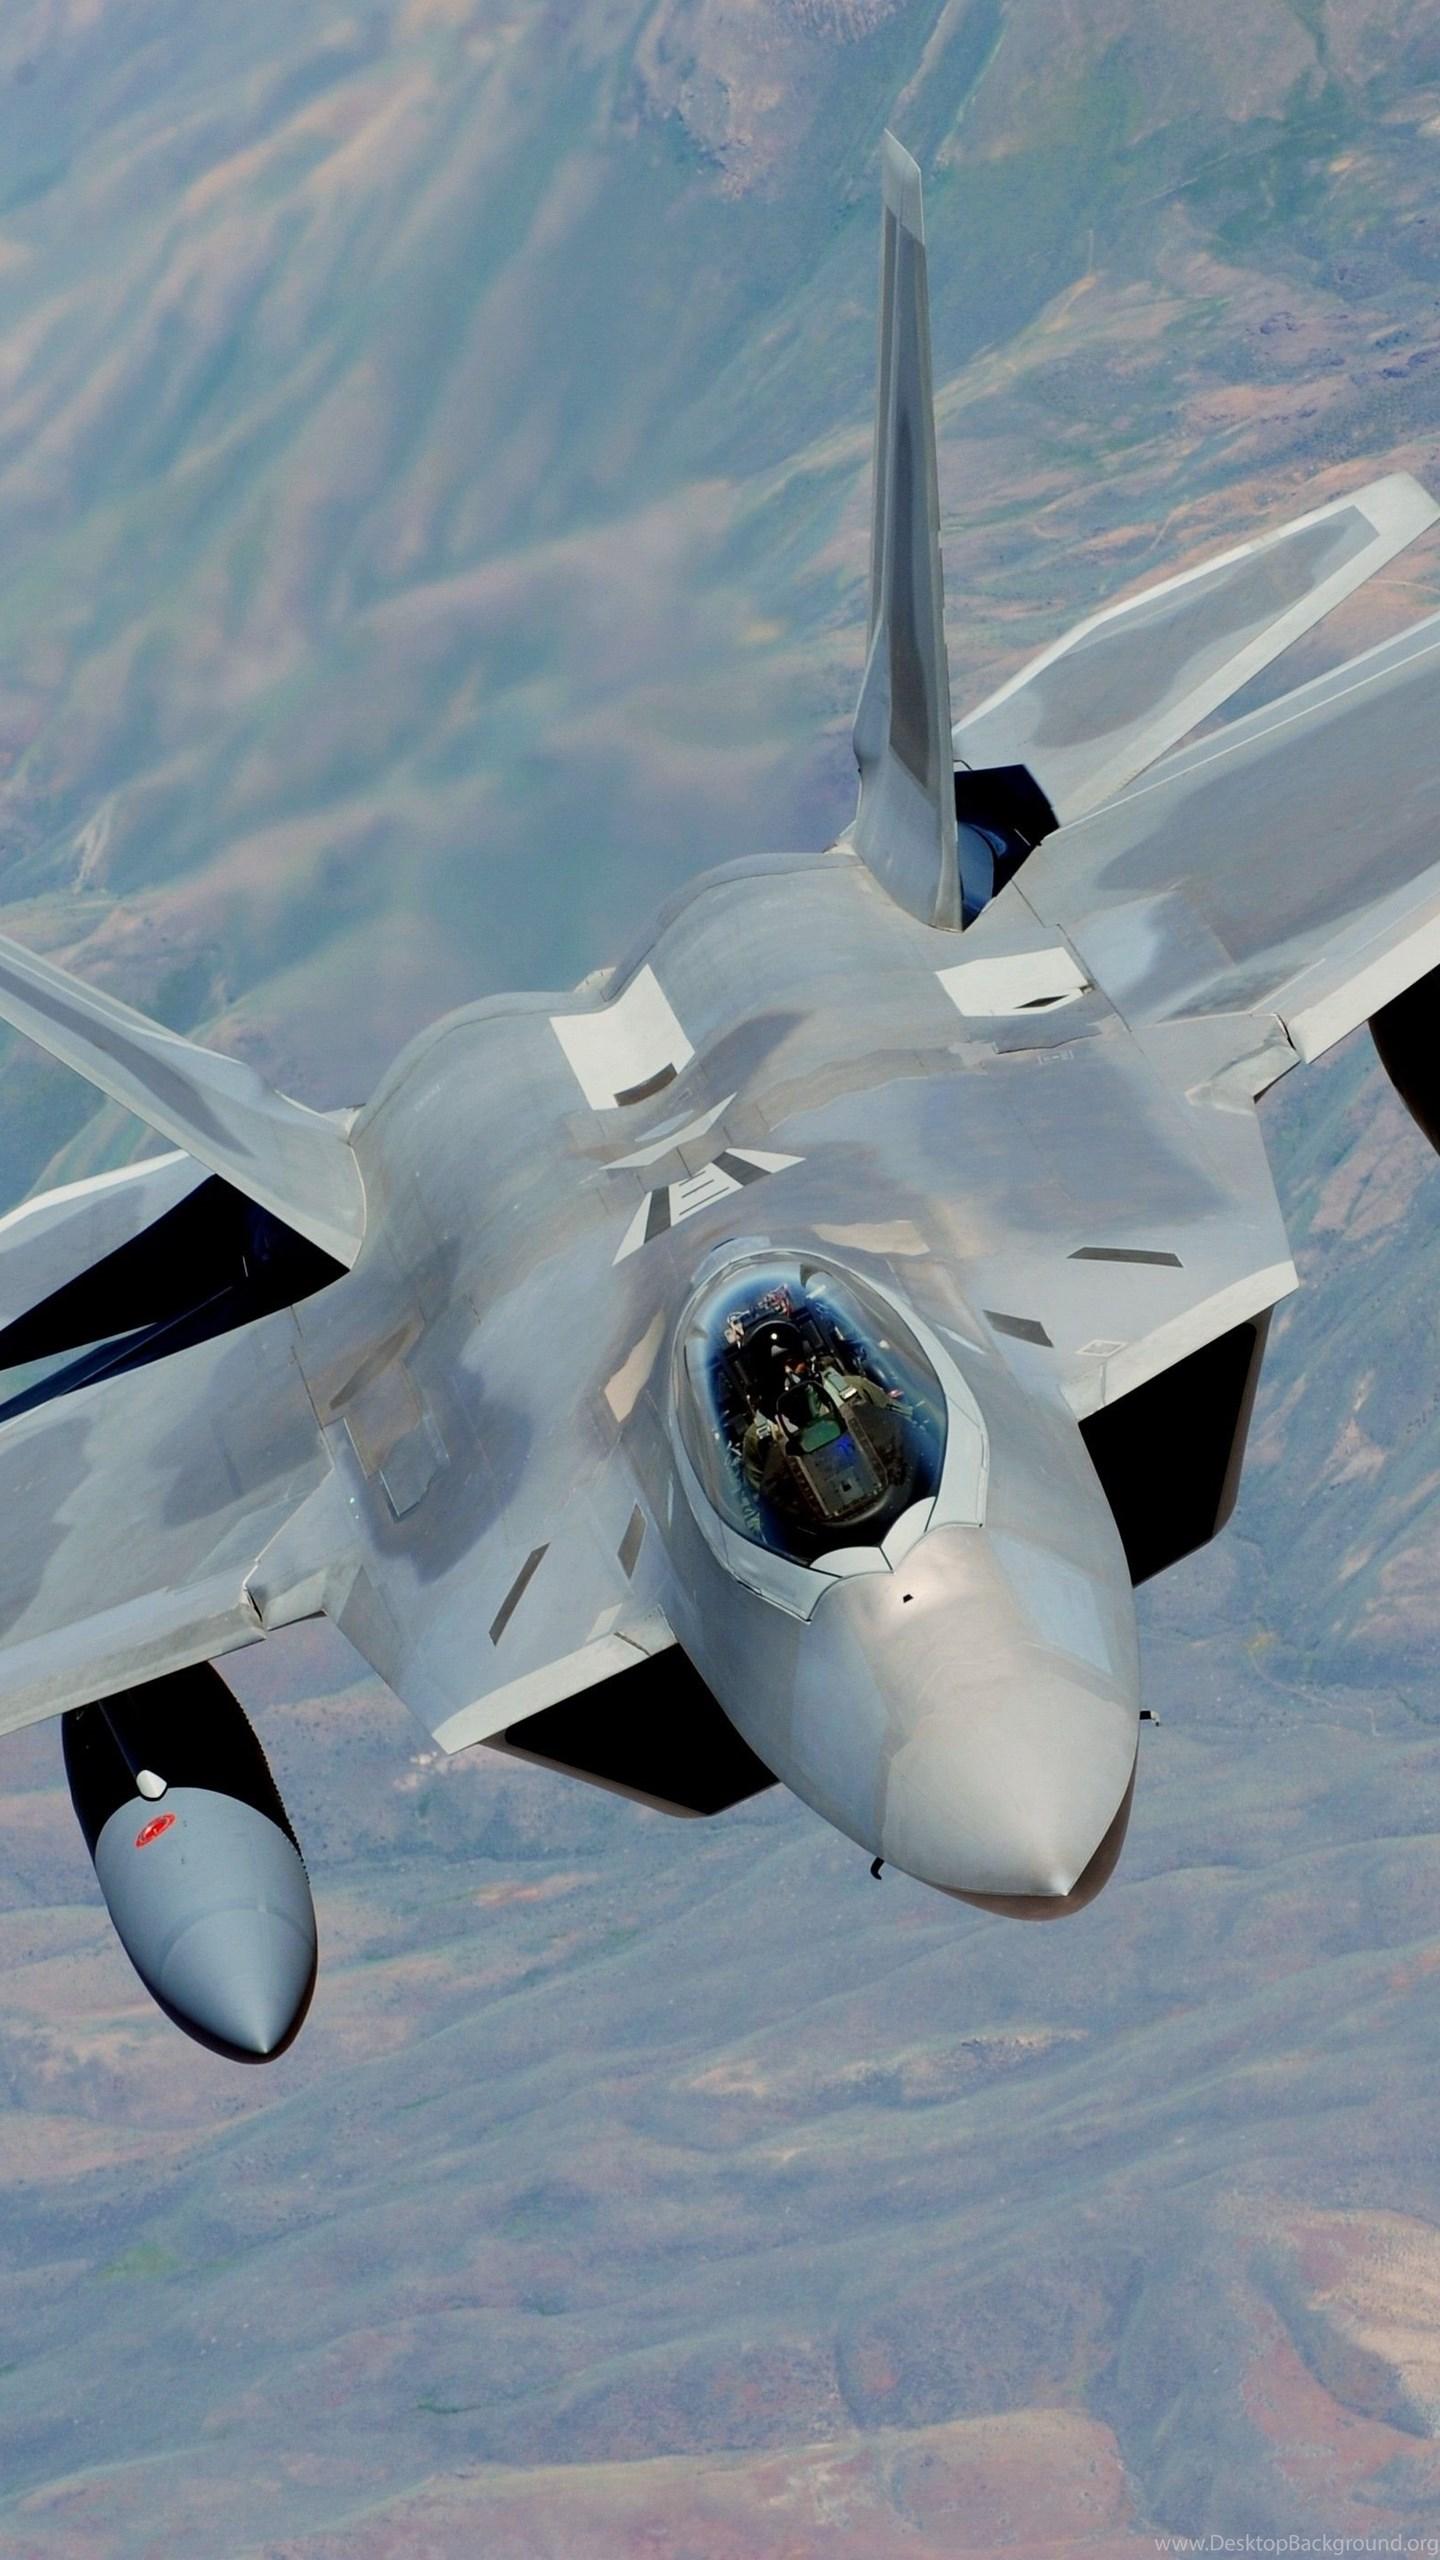 F 21 Wallpaper, Military / Aircrafts F 21, Raptor, Lockheed ...